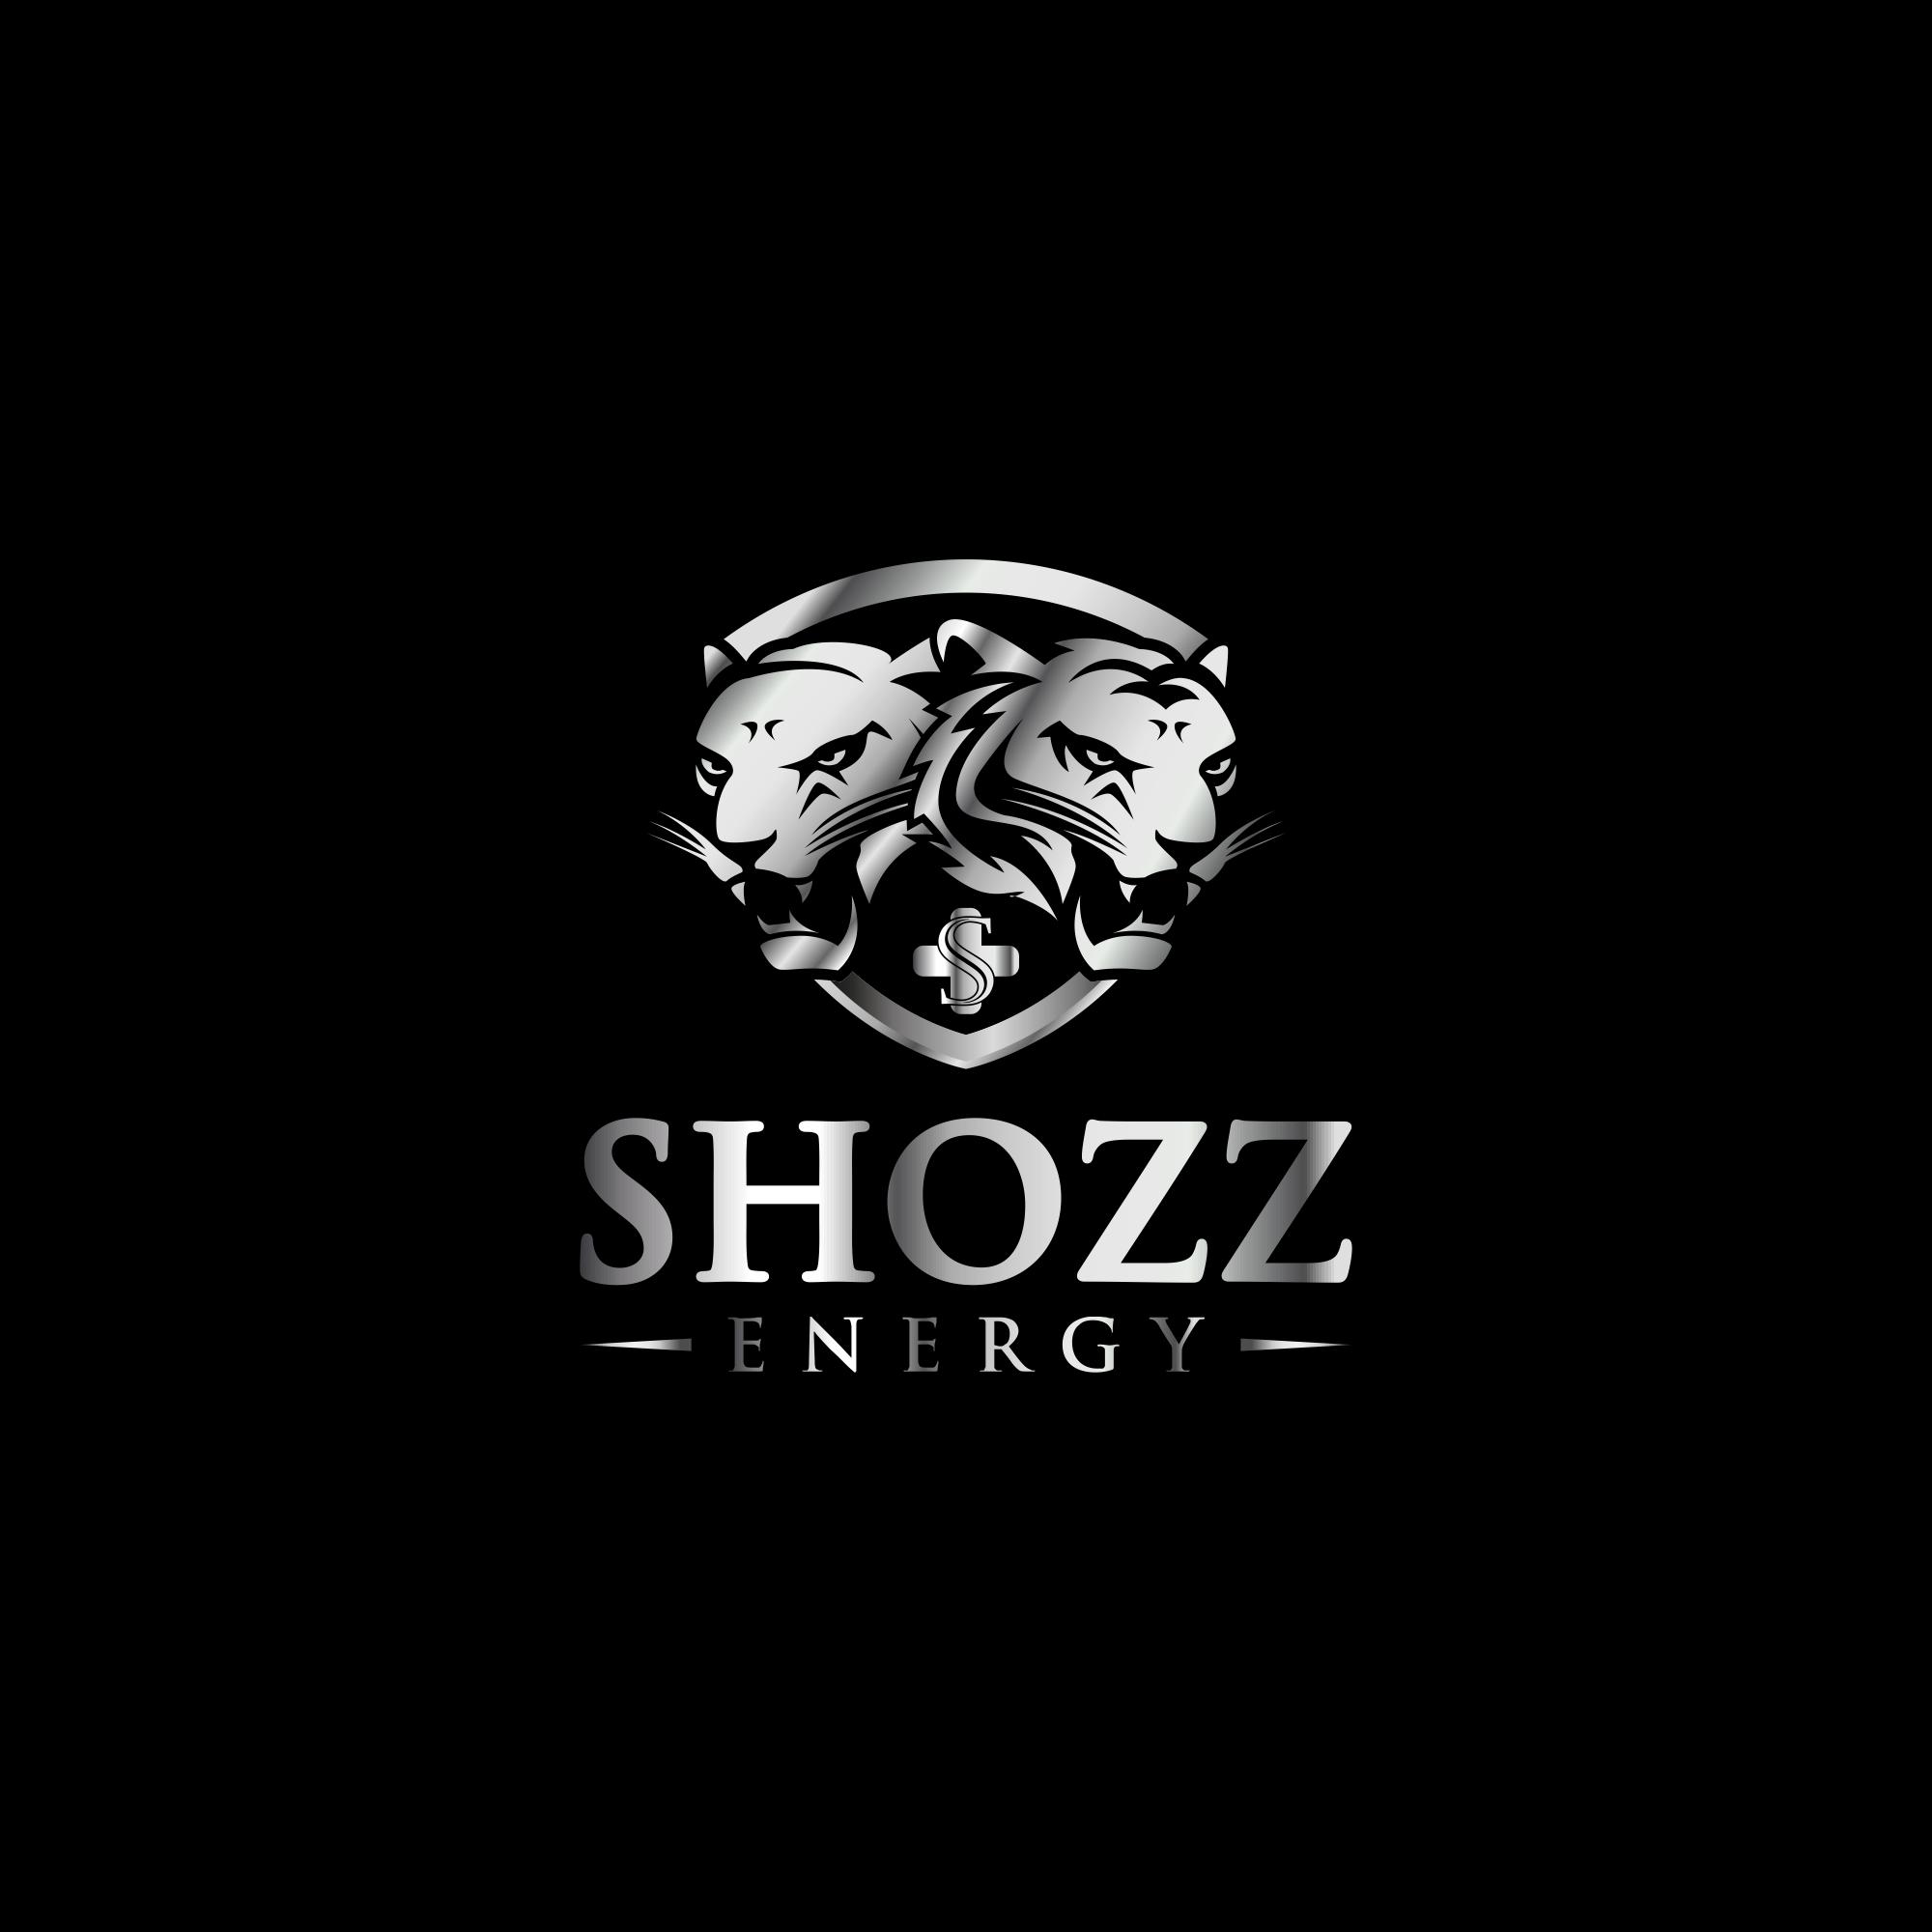 Design an elegant logo for a new ENERGY DRINK called SHOZZ